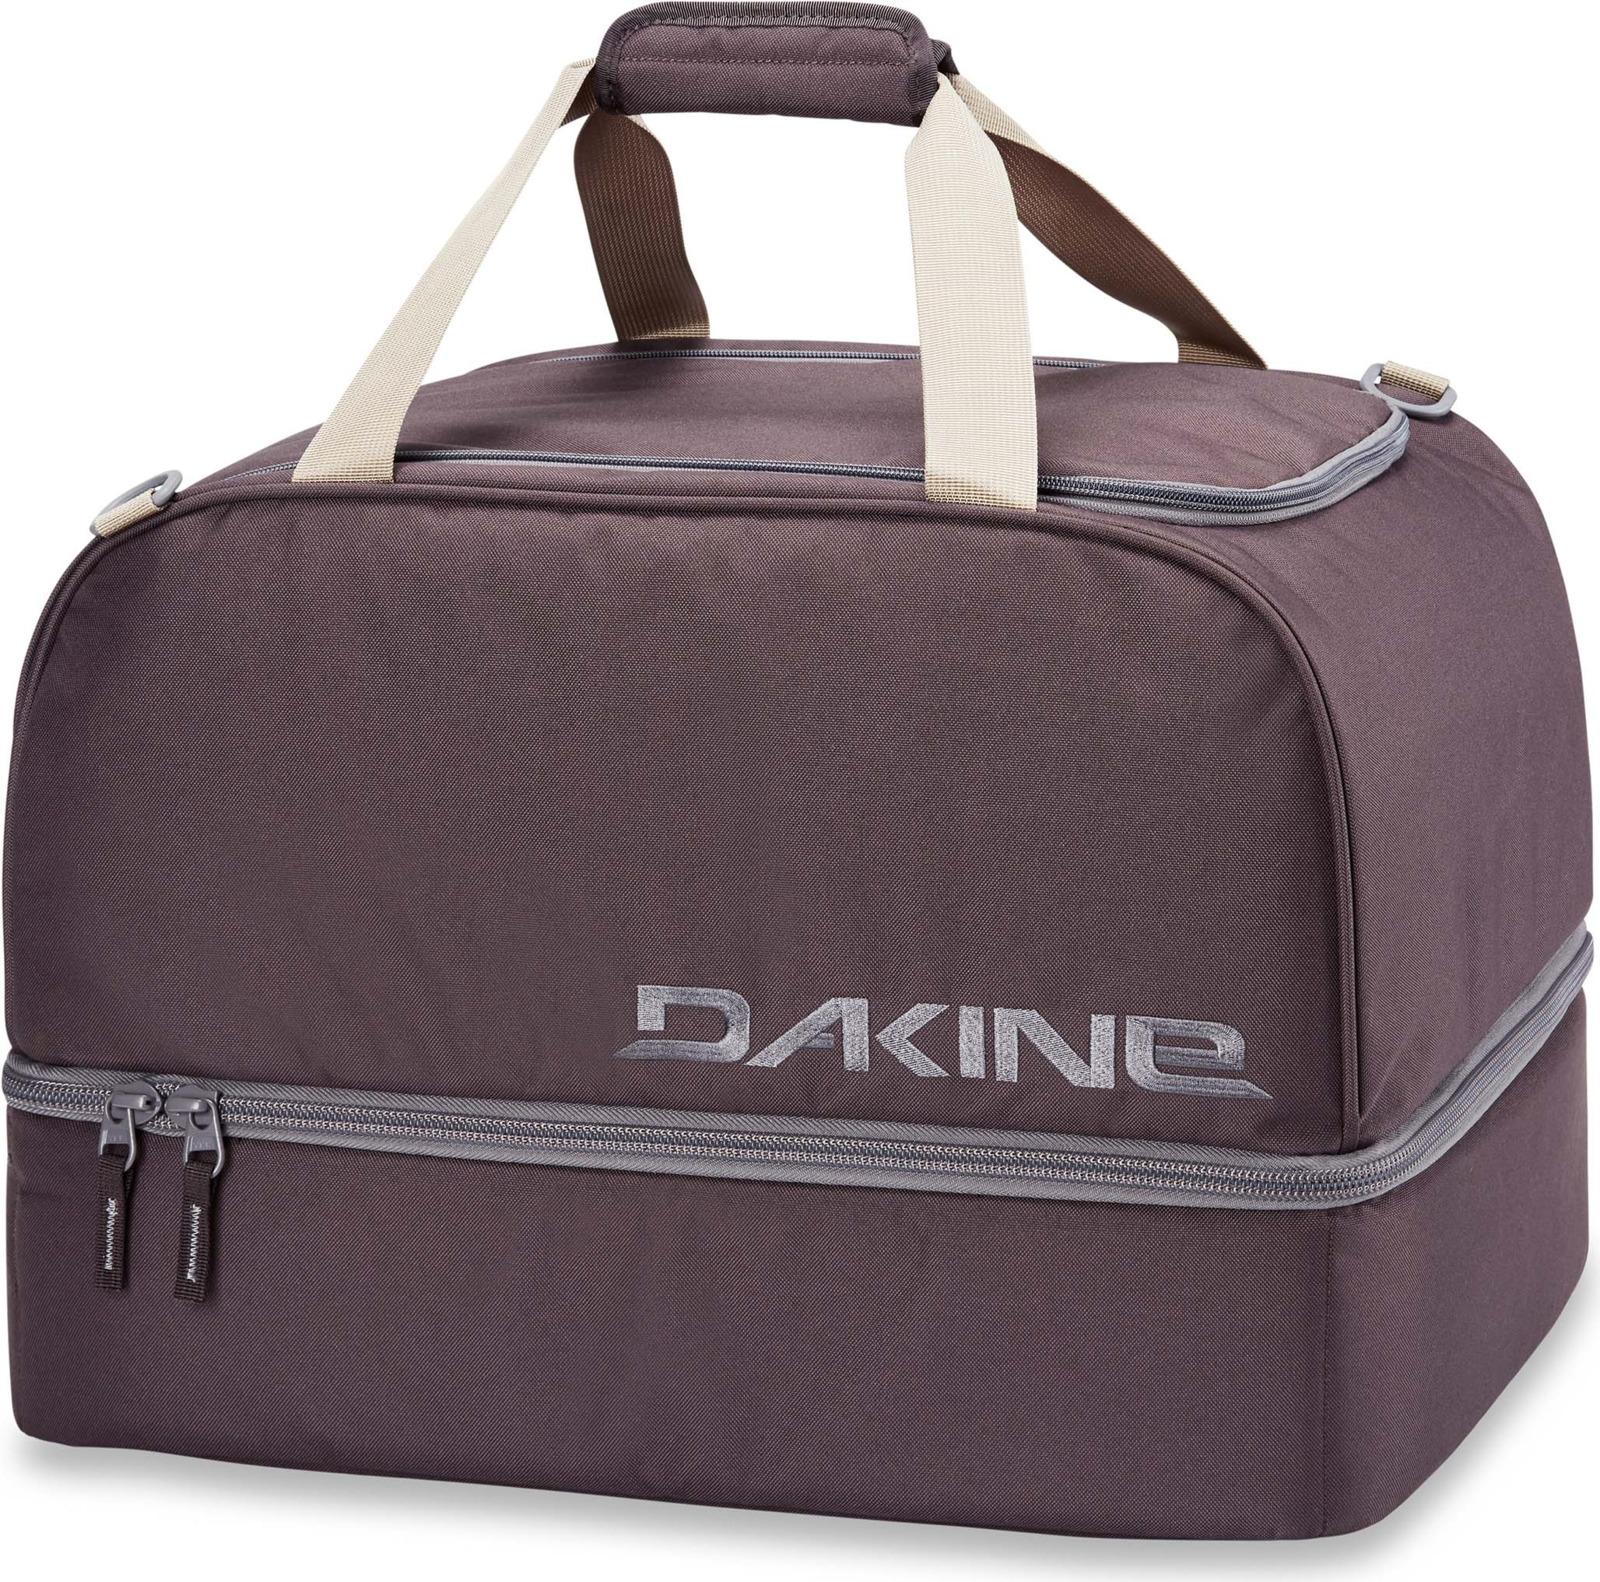 Сумка спортивная Dakine Boot Locker, цвет: фиолетовый, 69 л